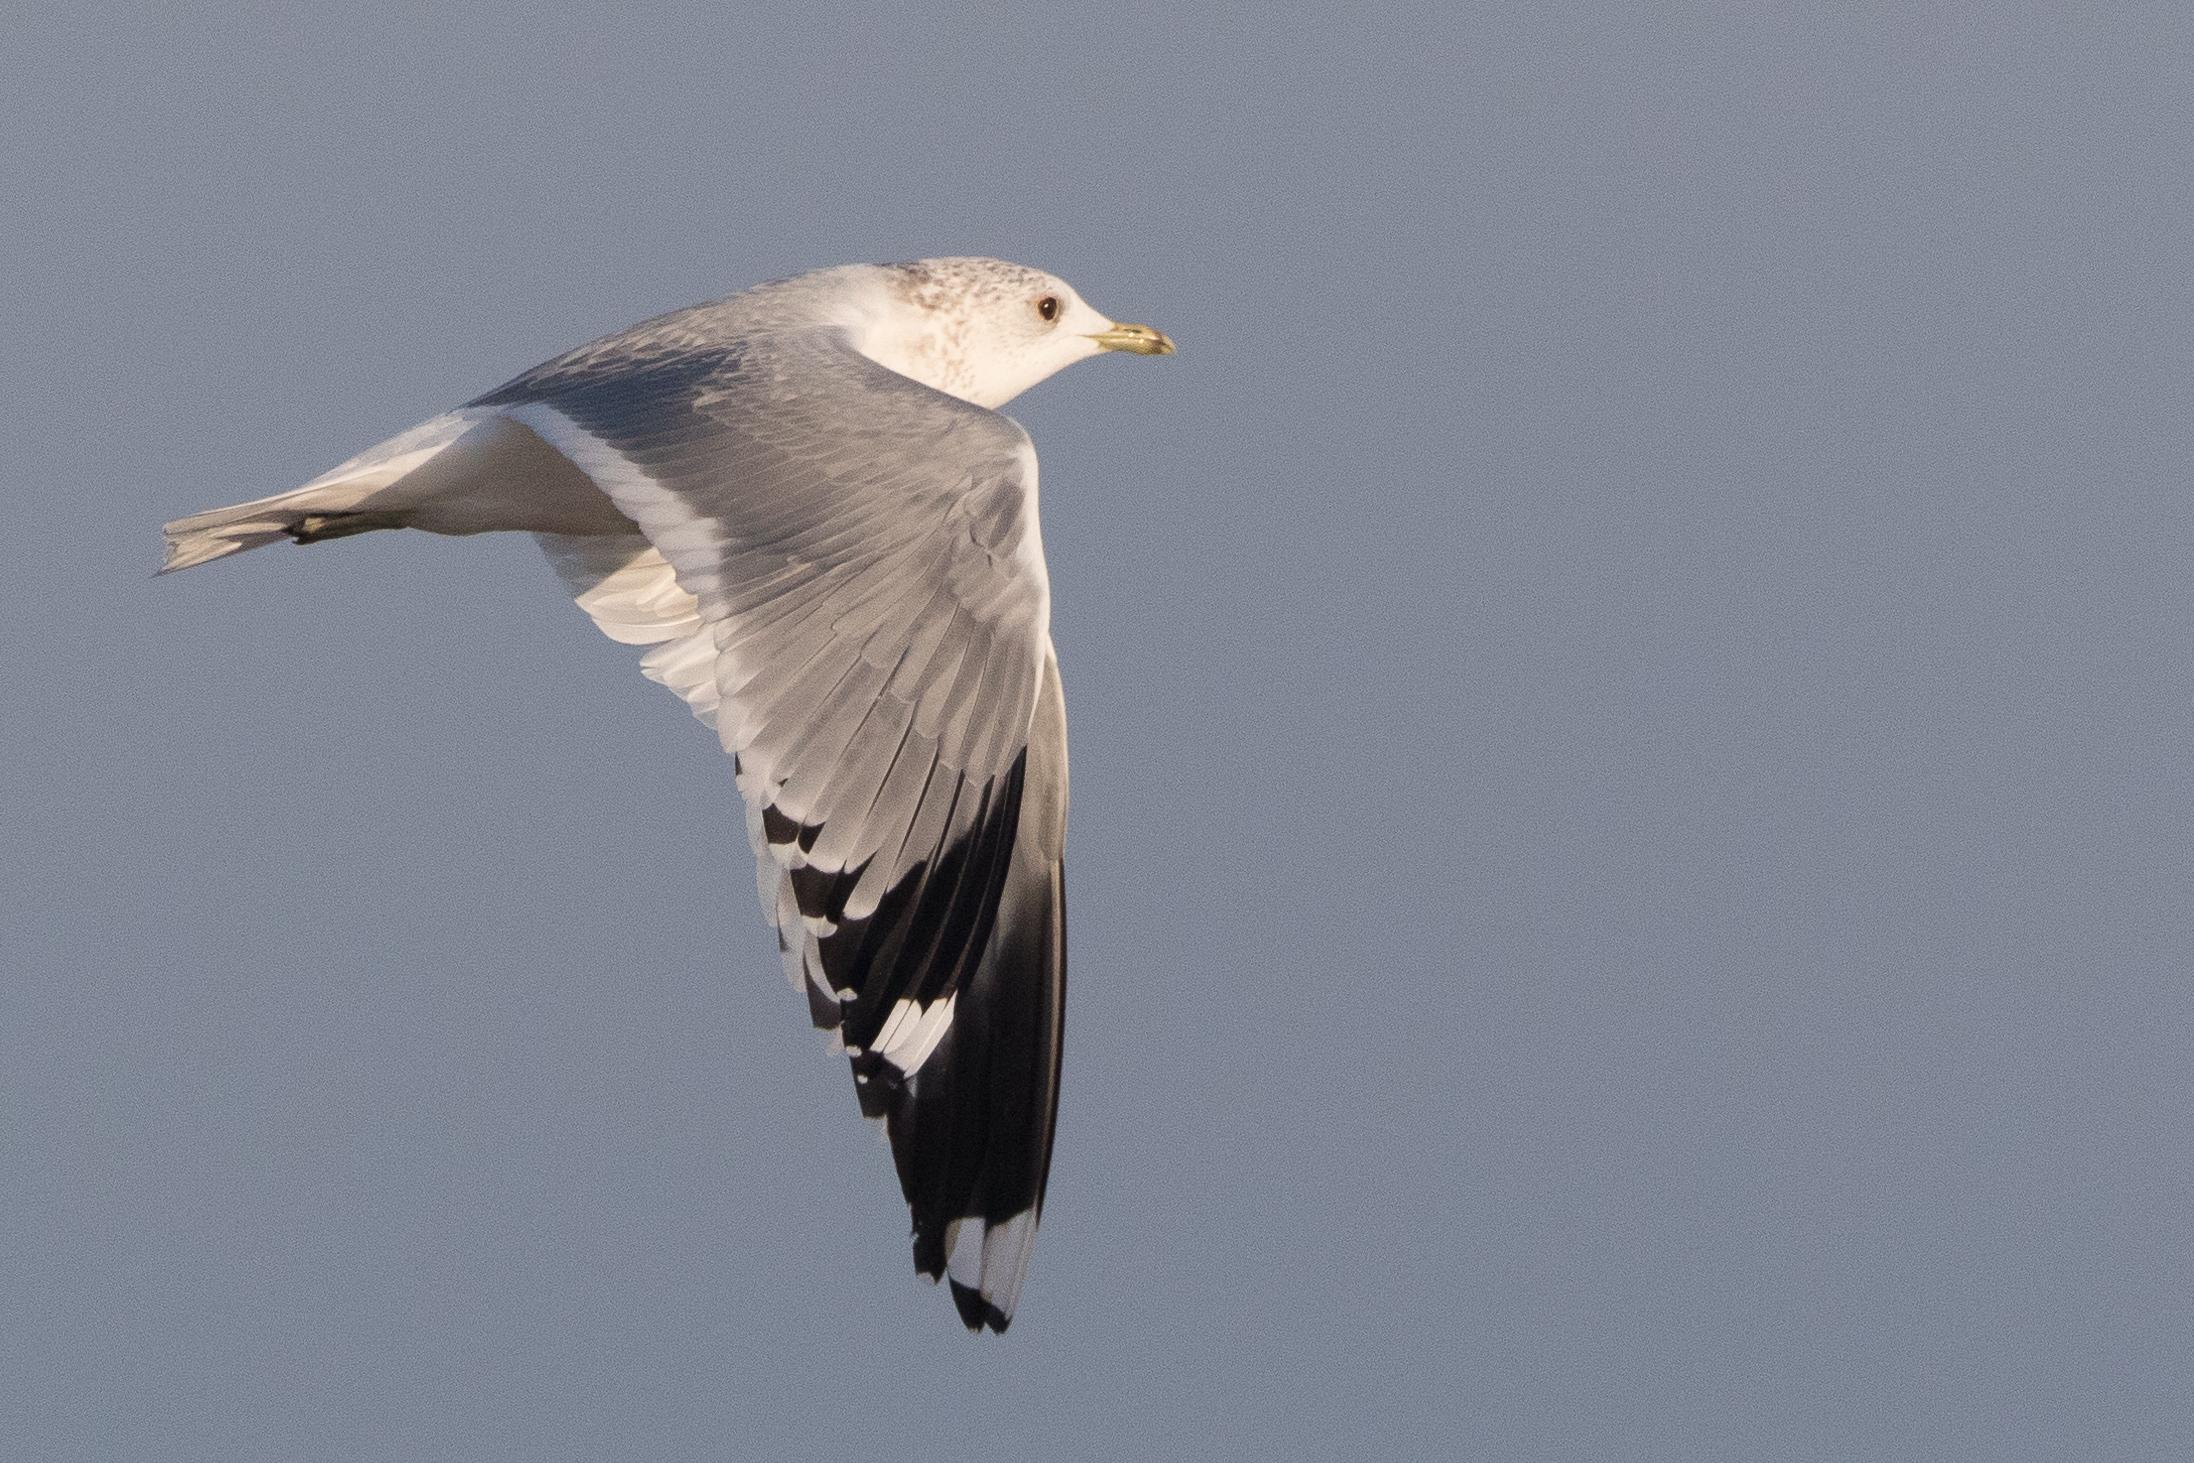 20170121-Common Gull Adult-04.jpg